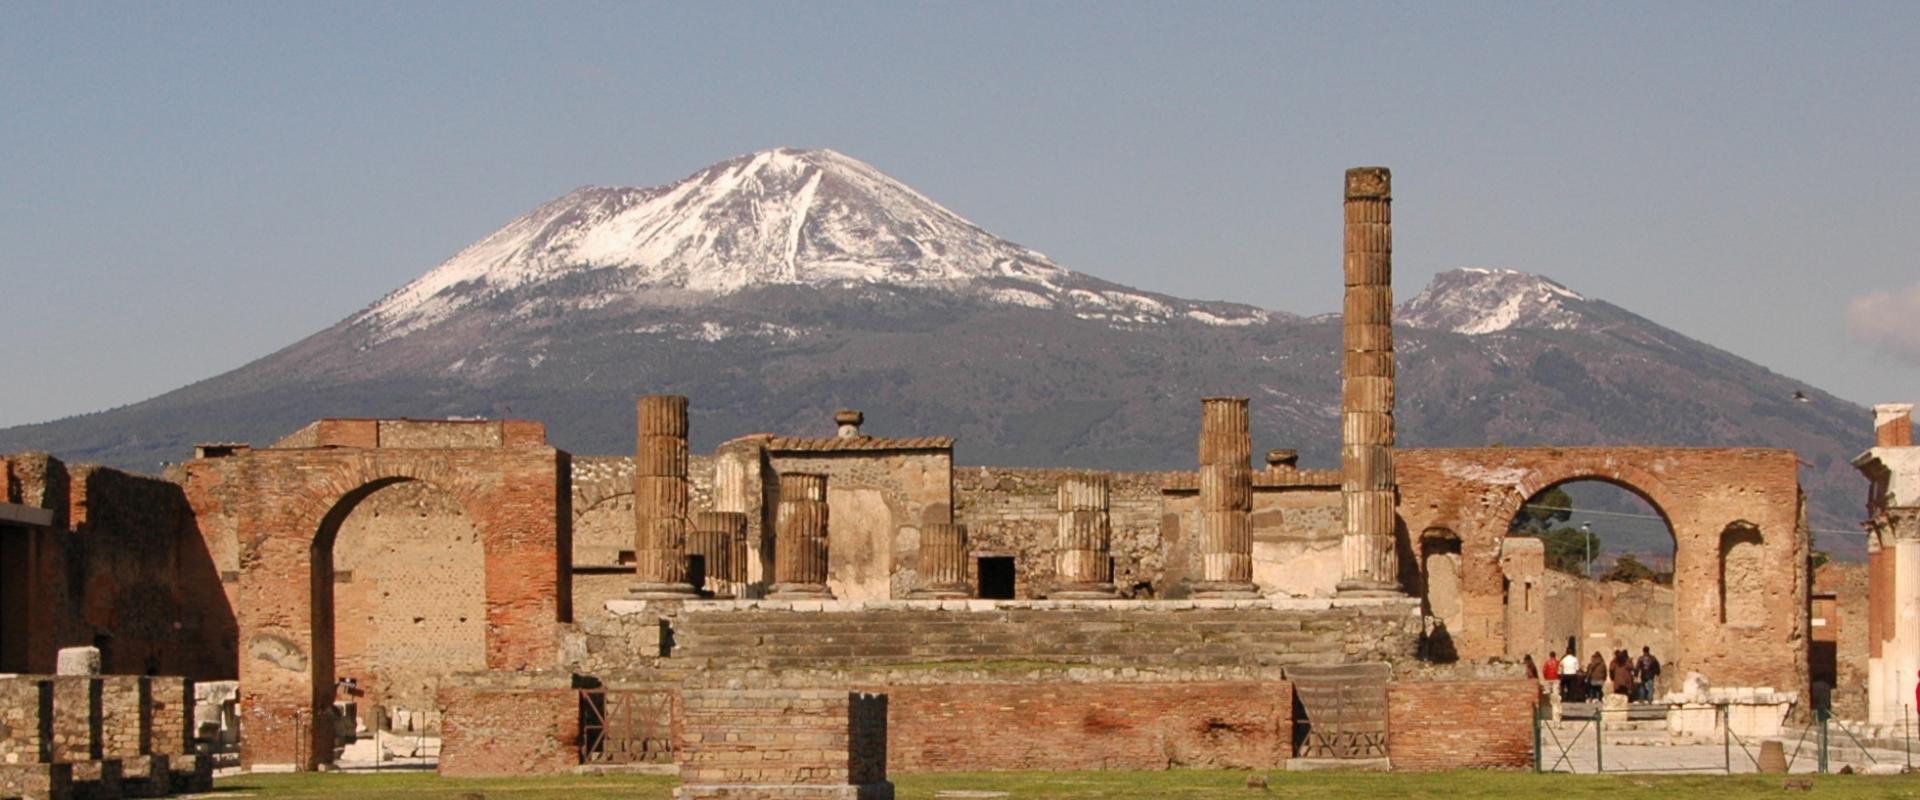 Visit of Pompei and excursion on Vesuvio